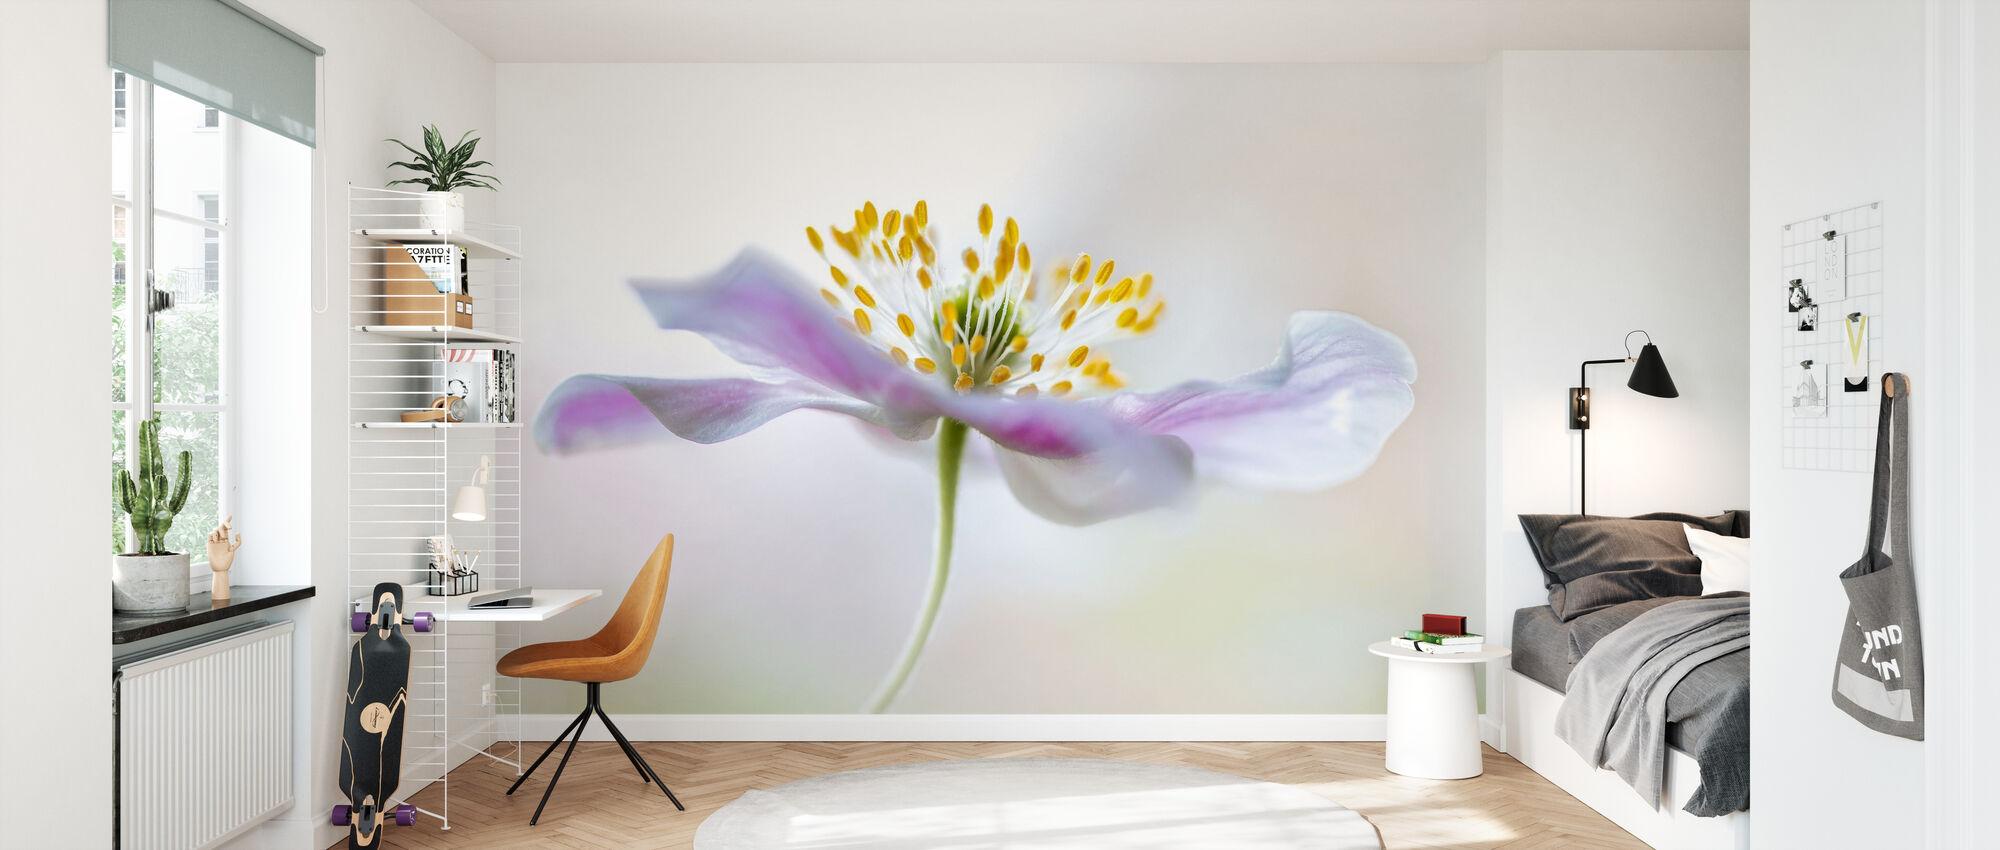 Wood Anemone - Wallpaper - Kids Room